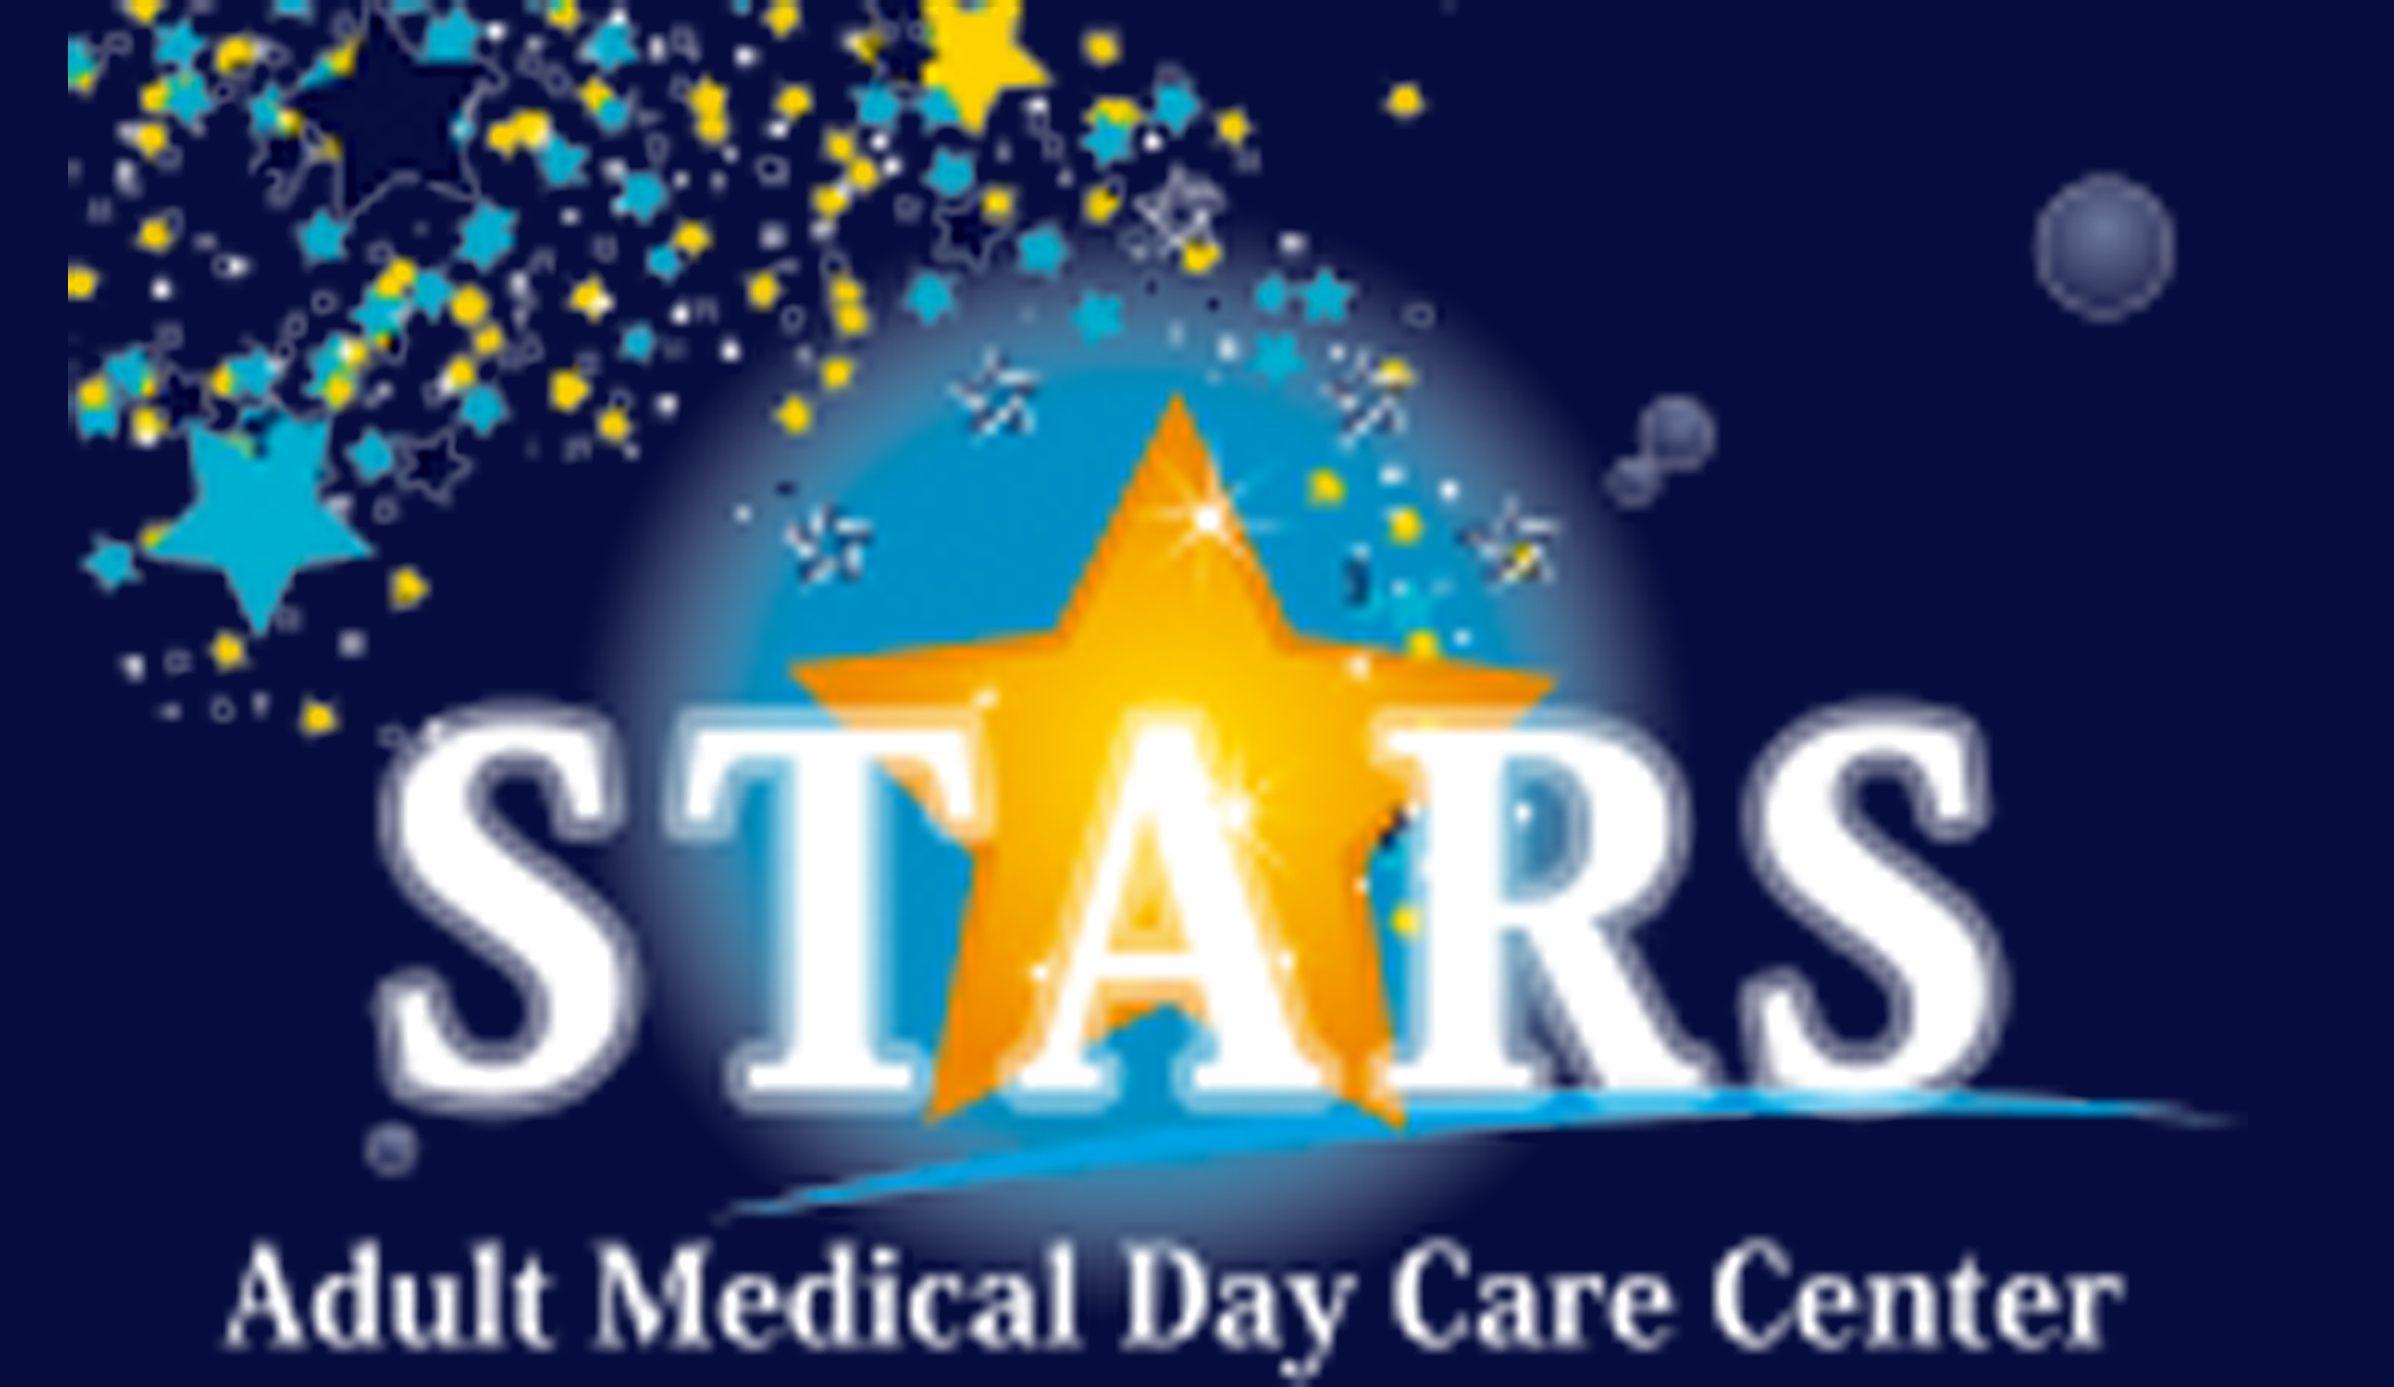 Stars-Adult-Medical-Center